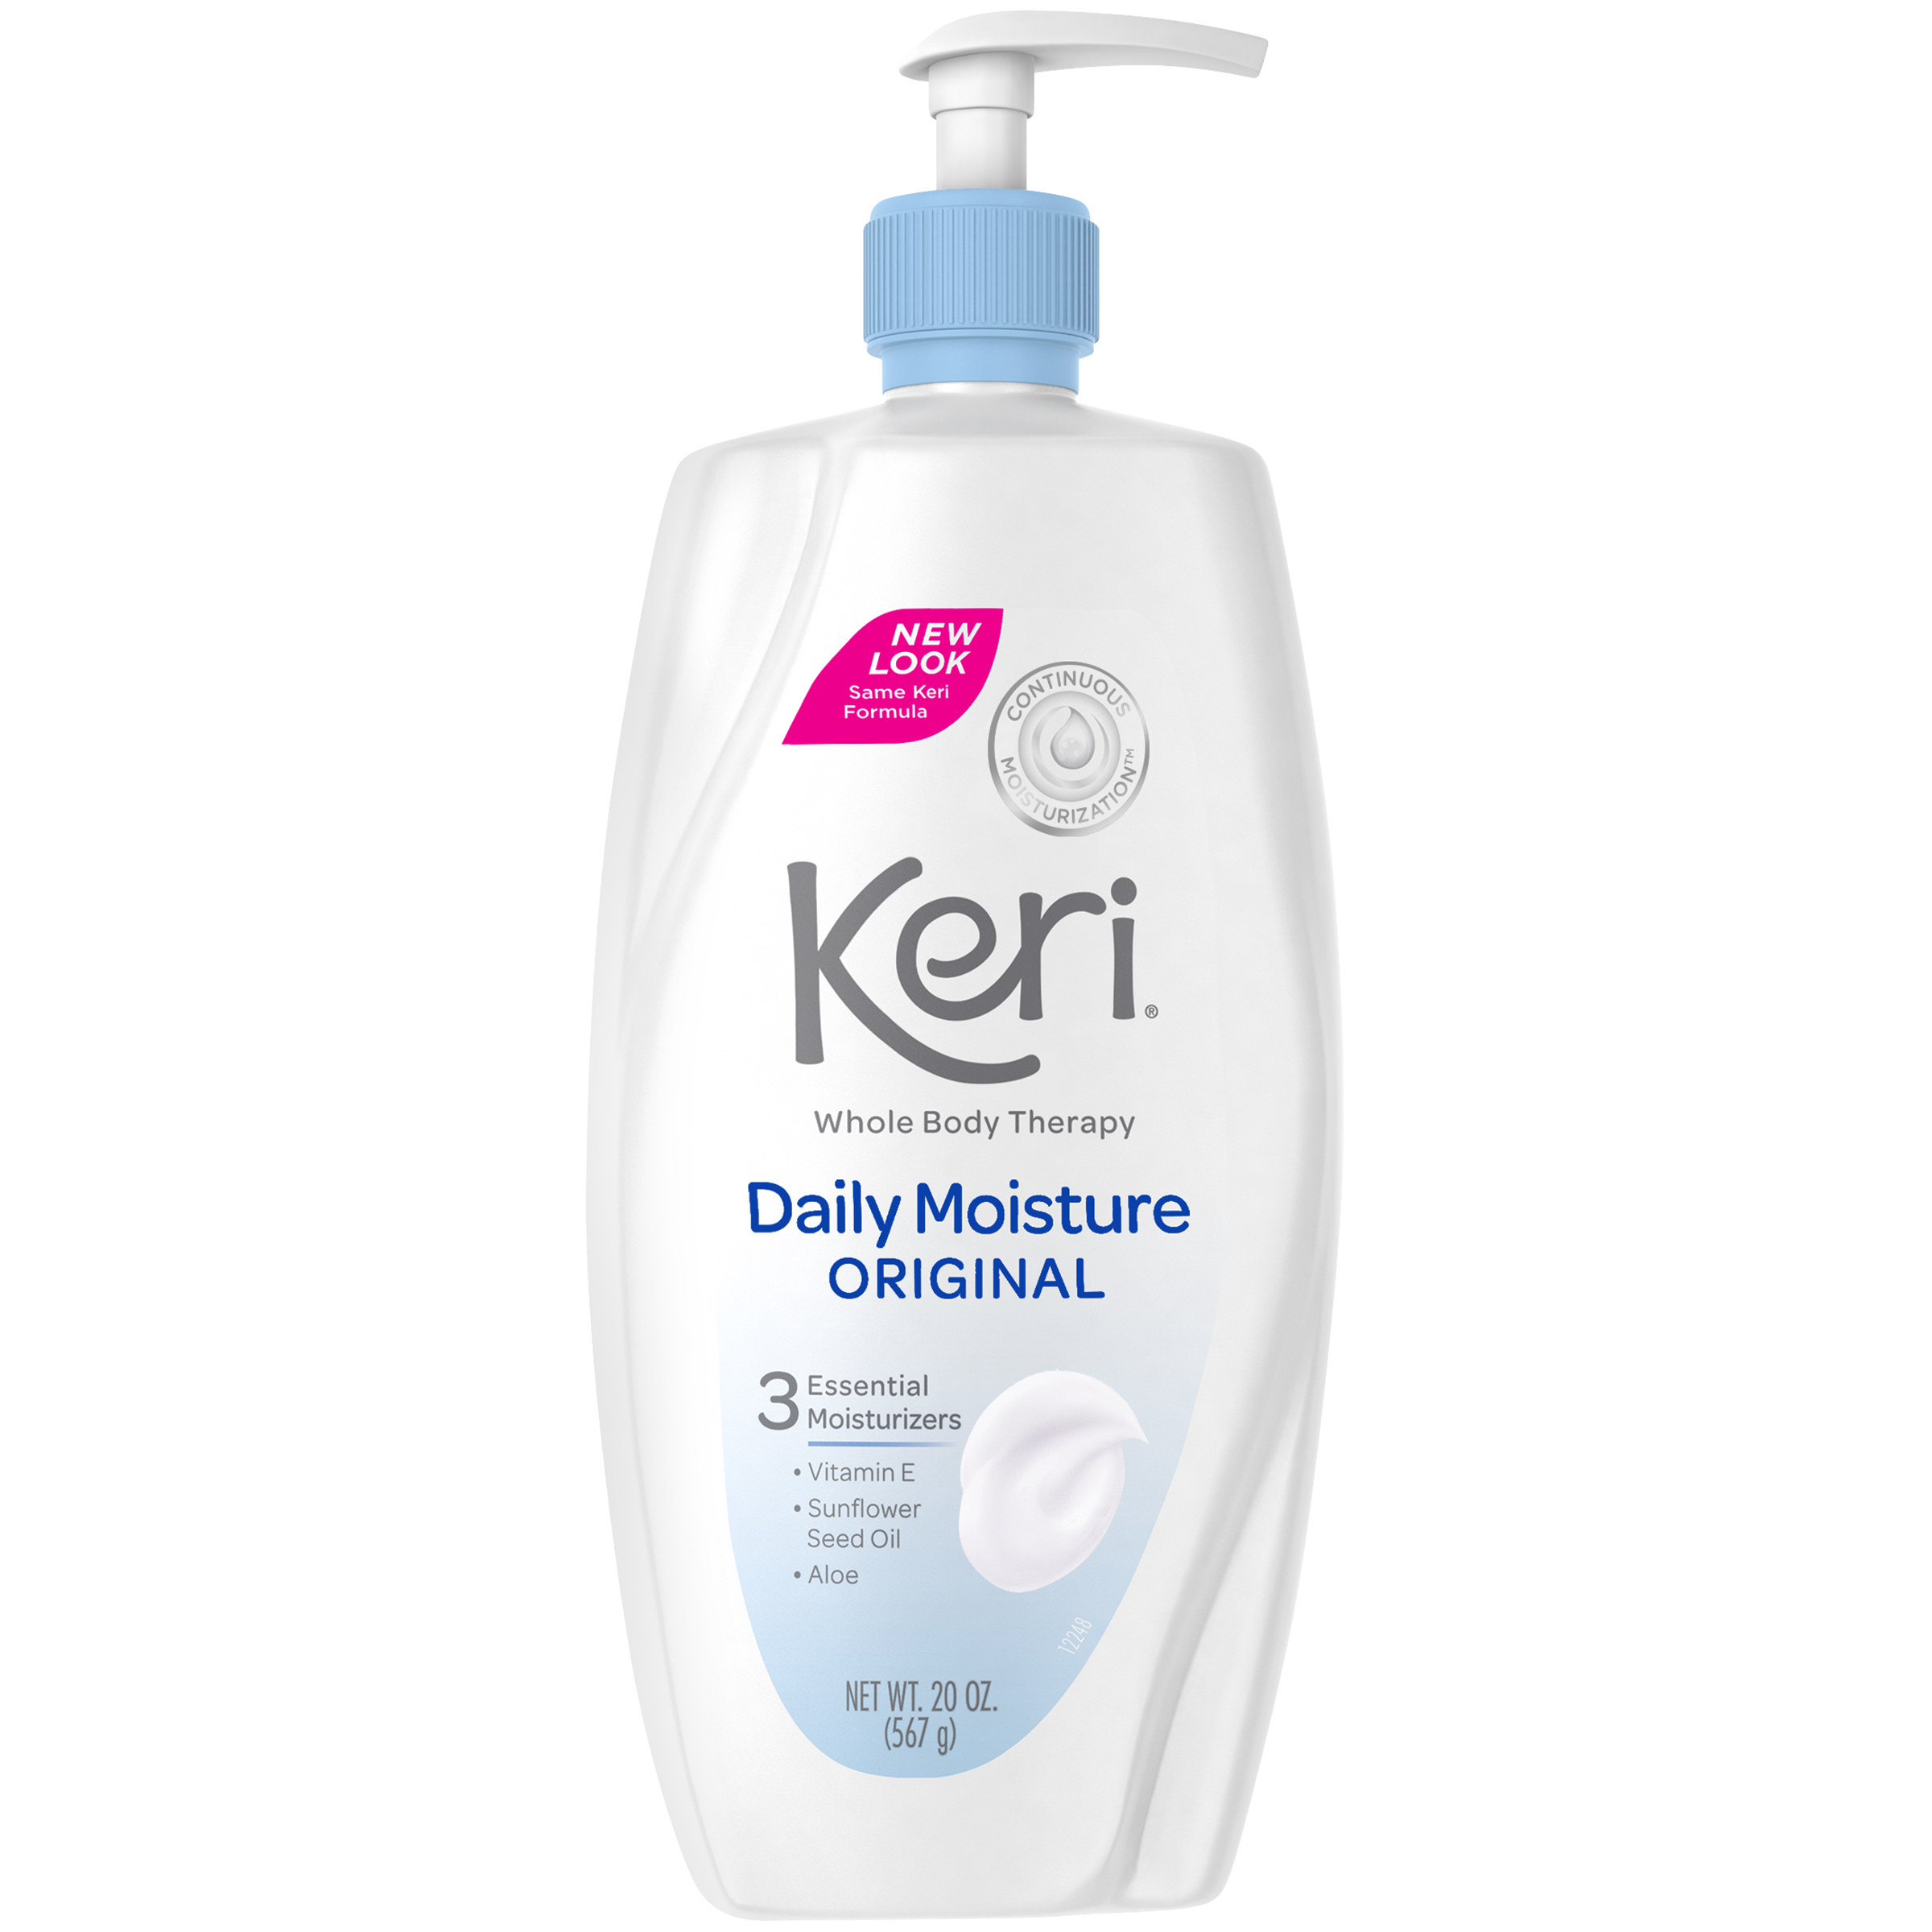 Keri Daily Dry Skin Therapy Moisture Original Body Lotion, 20 oz